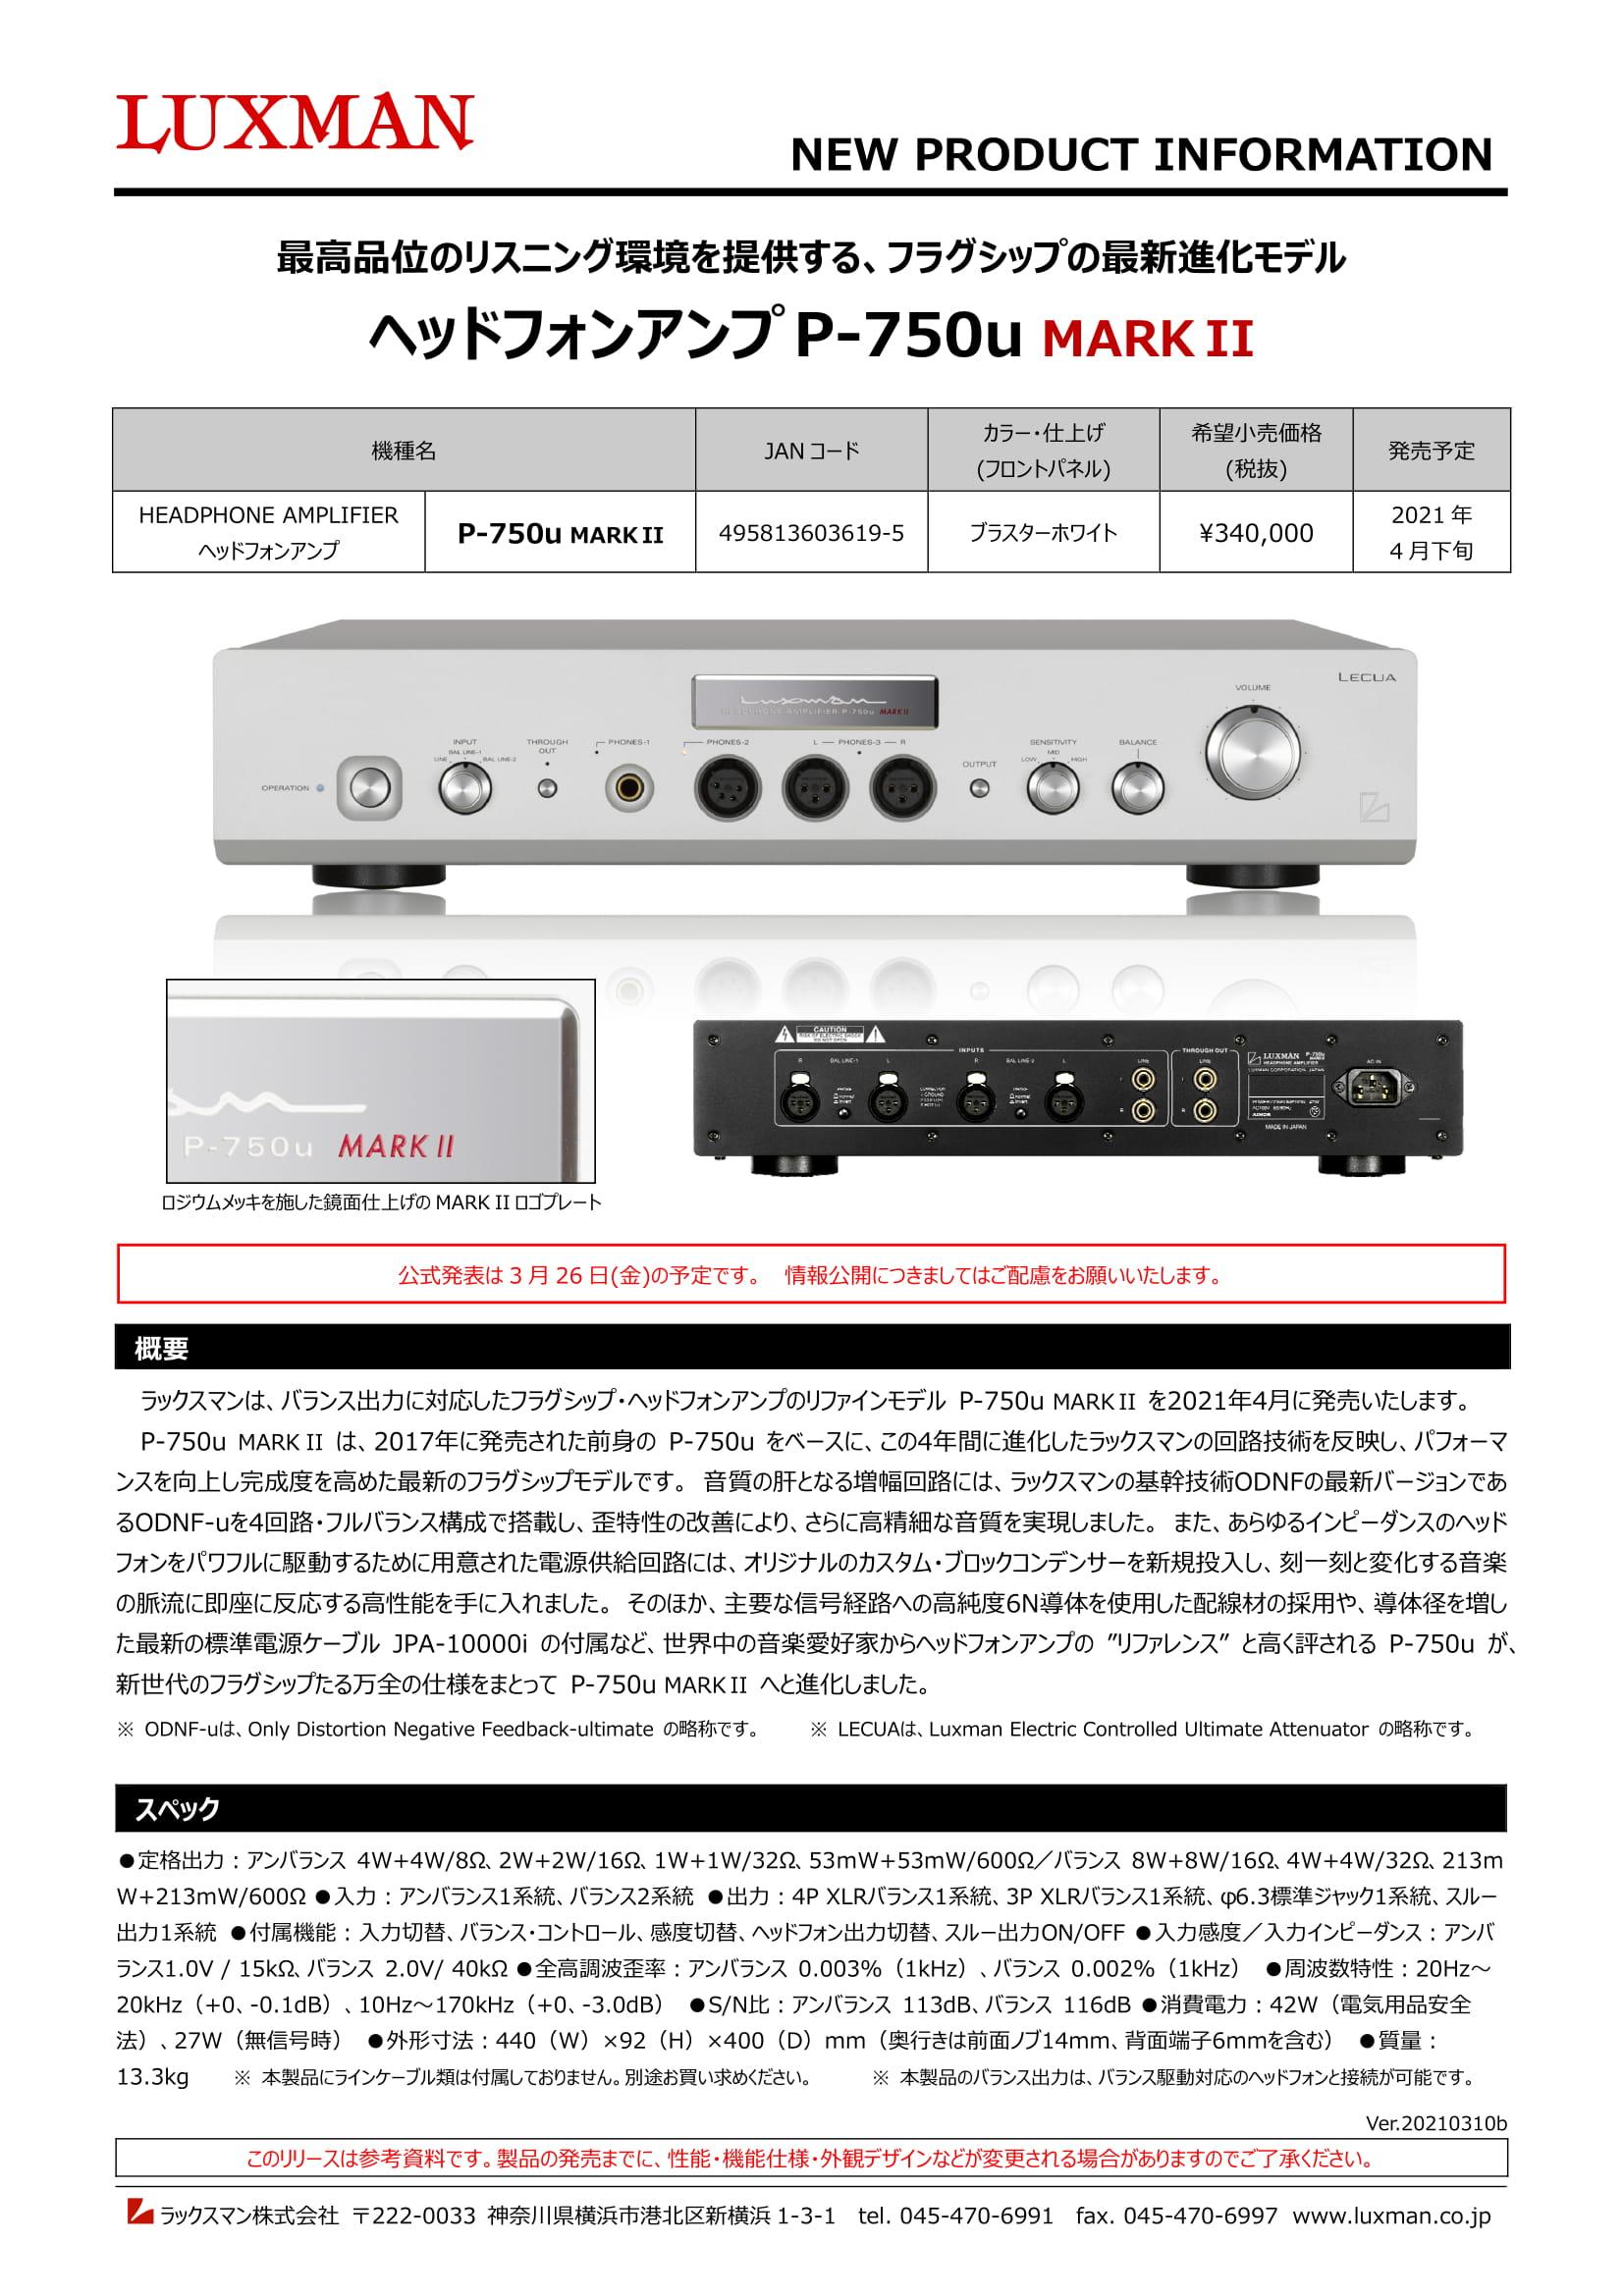 210326 P-750u2リリースb-1